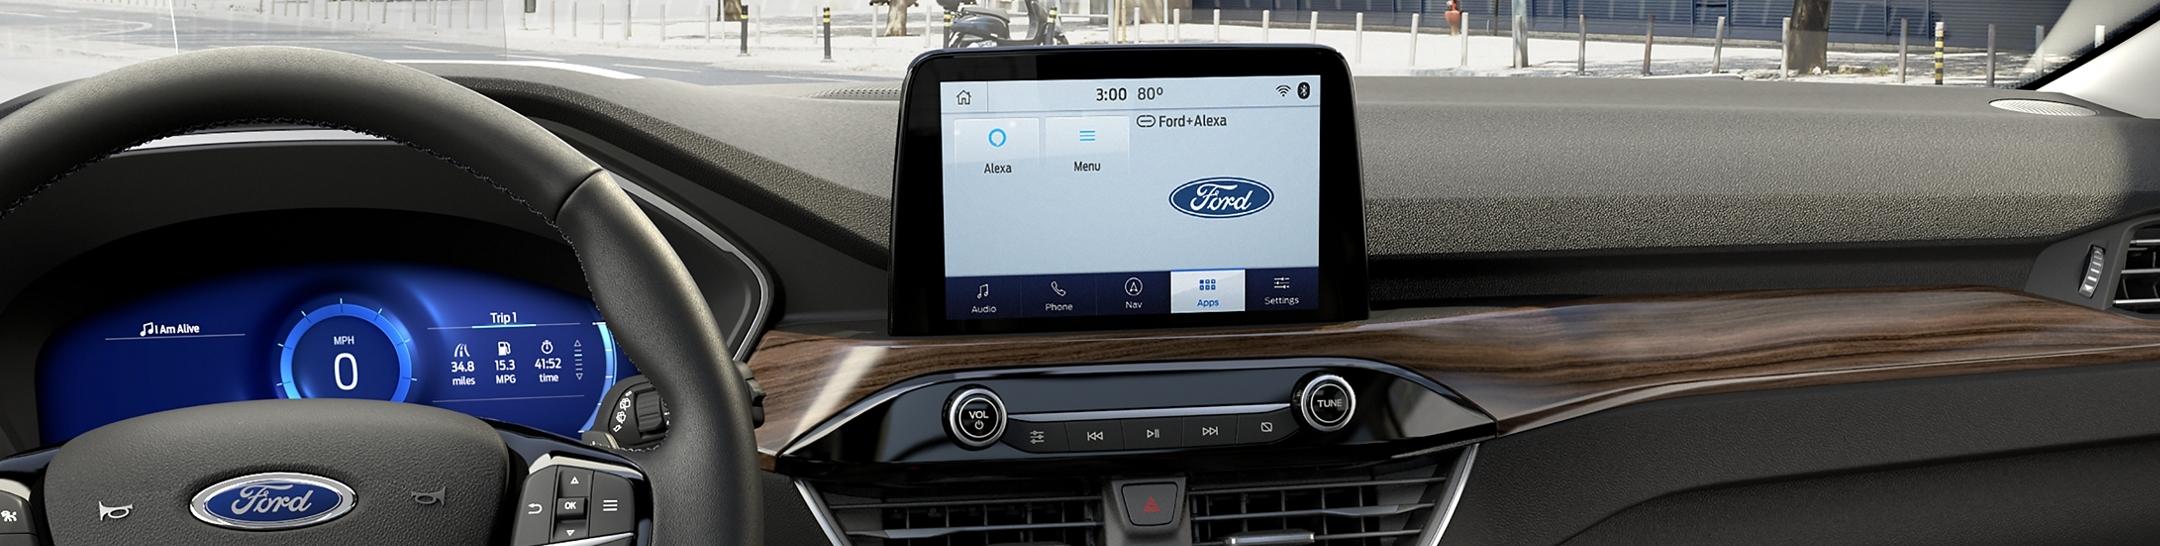 2020 Ford Mustang Ford + Alexa App